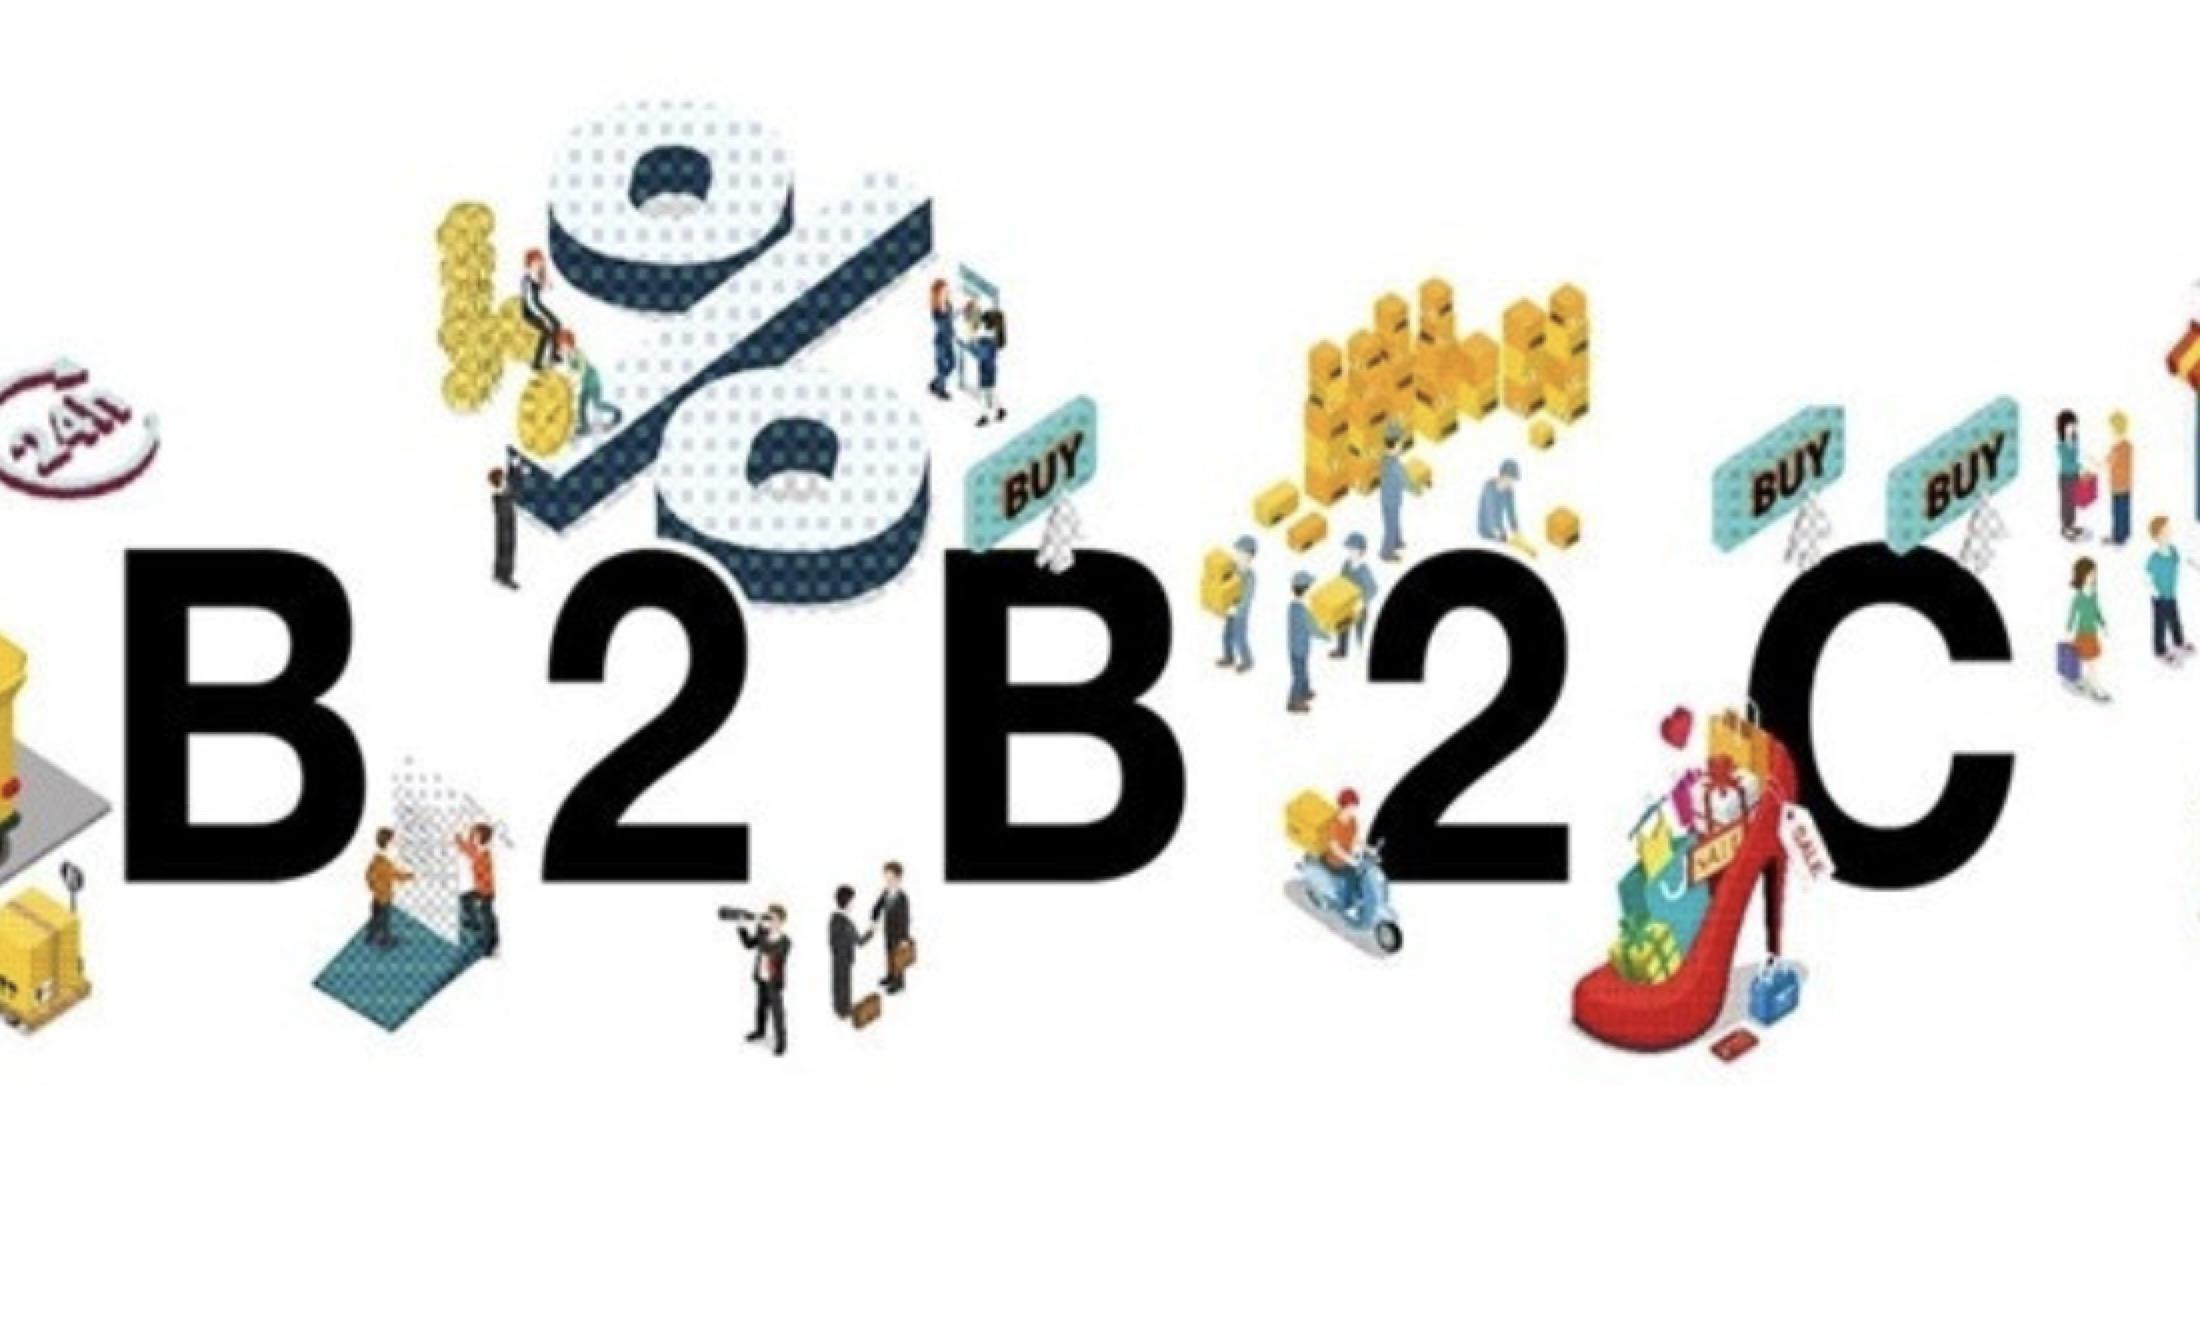 B2B2C商城系统和B2C商城系统的区别,这篇文章都讲明白了!